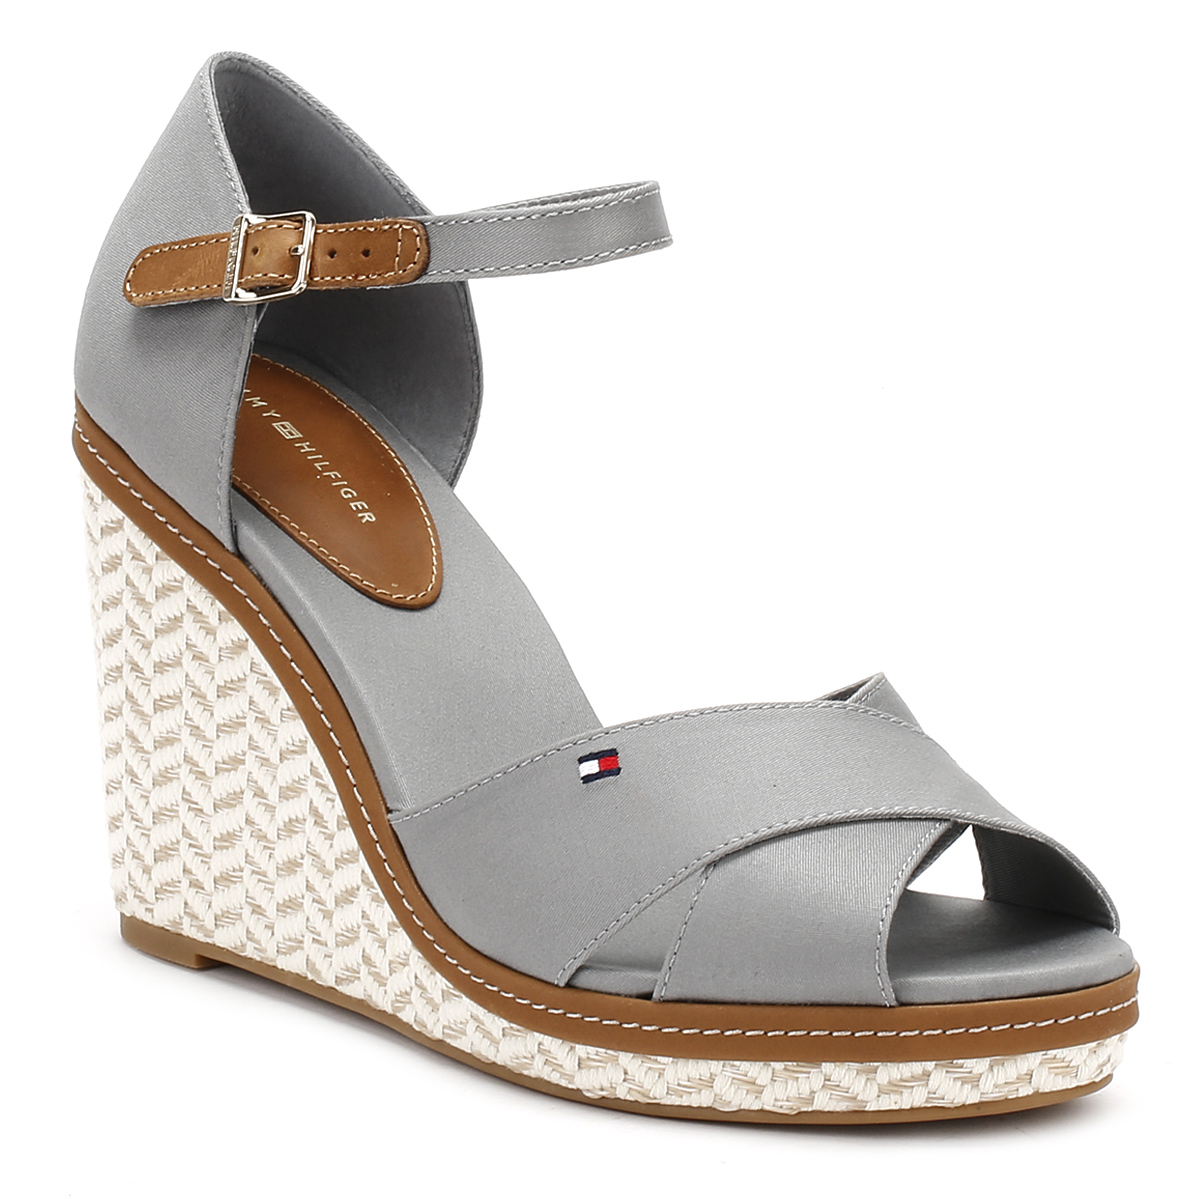 Www Womens Wedge Heel Casual Shoes Co Uk